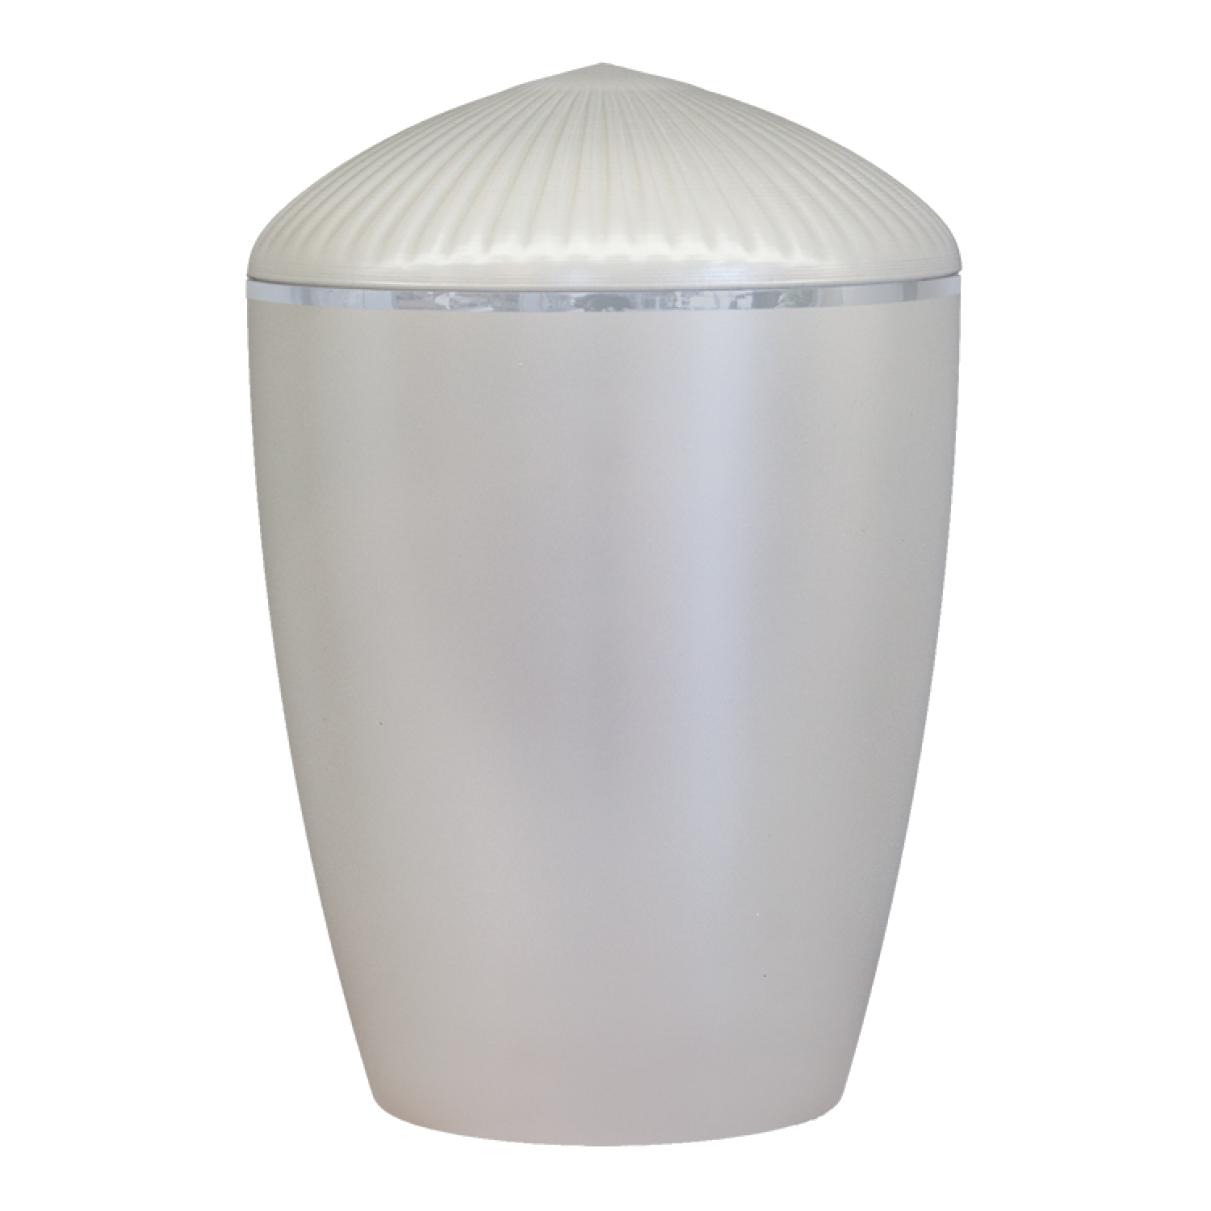 Ferndown Silver Band Cremation Urn – Pearl